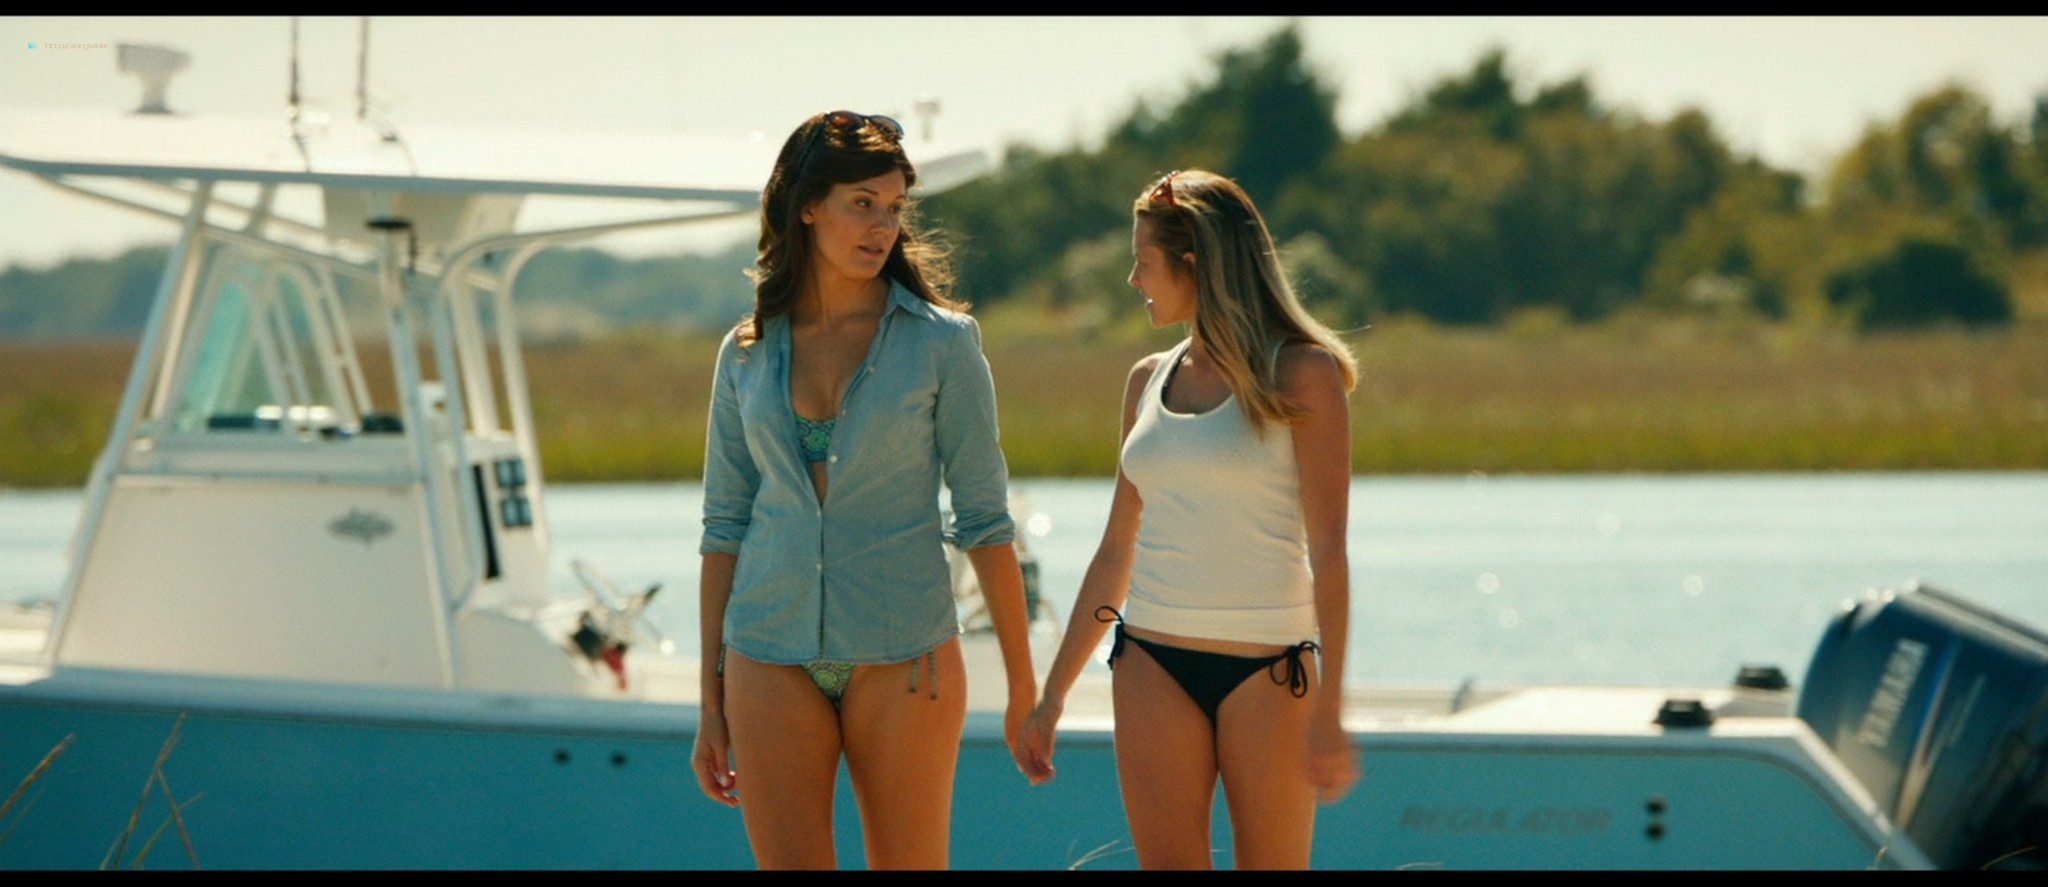 Teresa Palmer hot bikini and Maggie Grace, Alexandra Daddario hot too - The Choice (2016) HD 1080p BluRay (11)